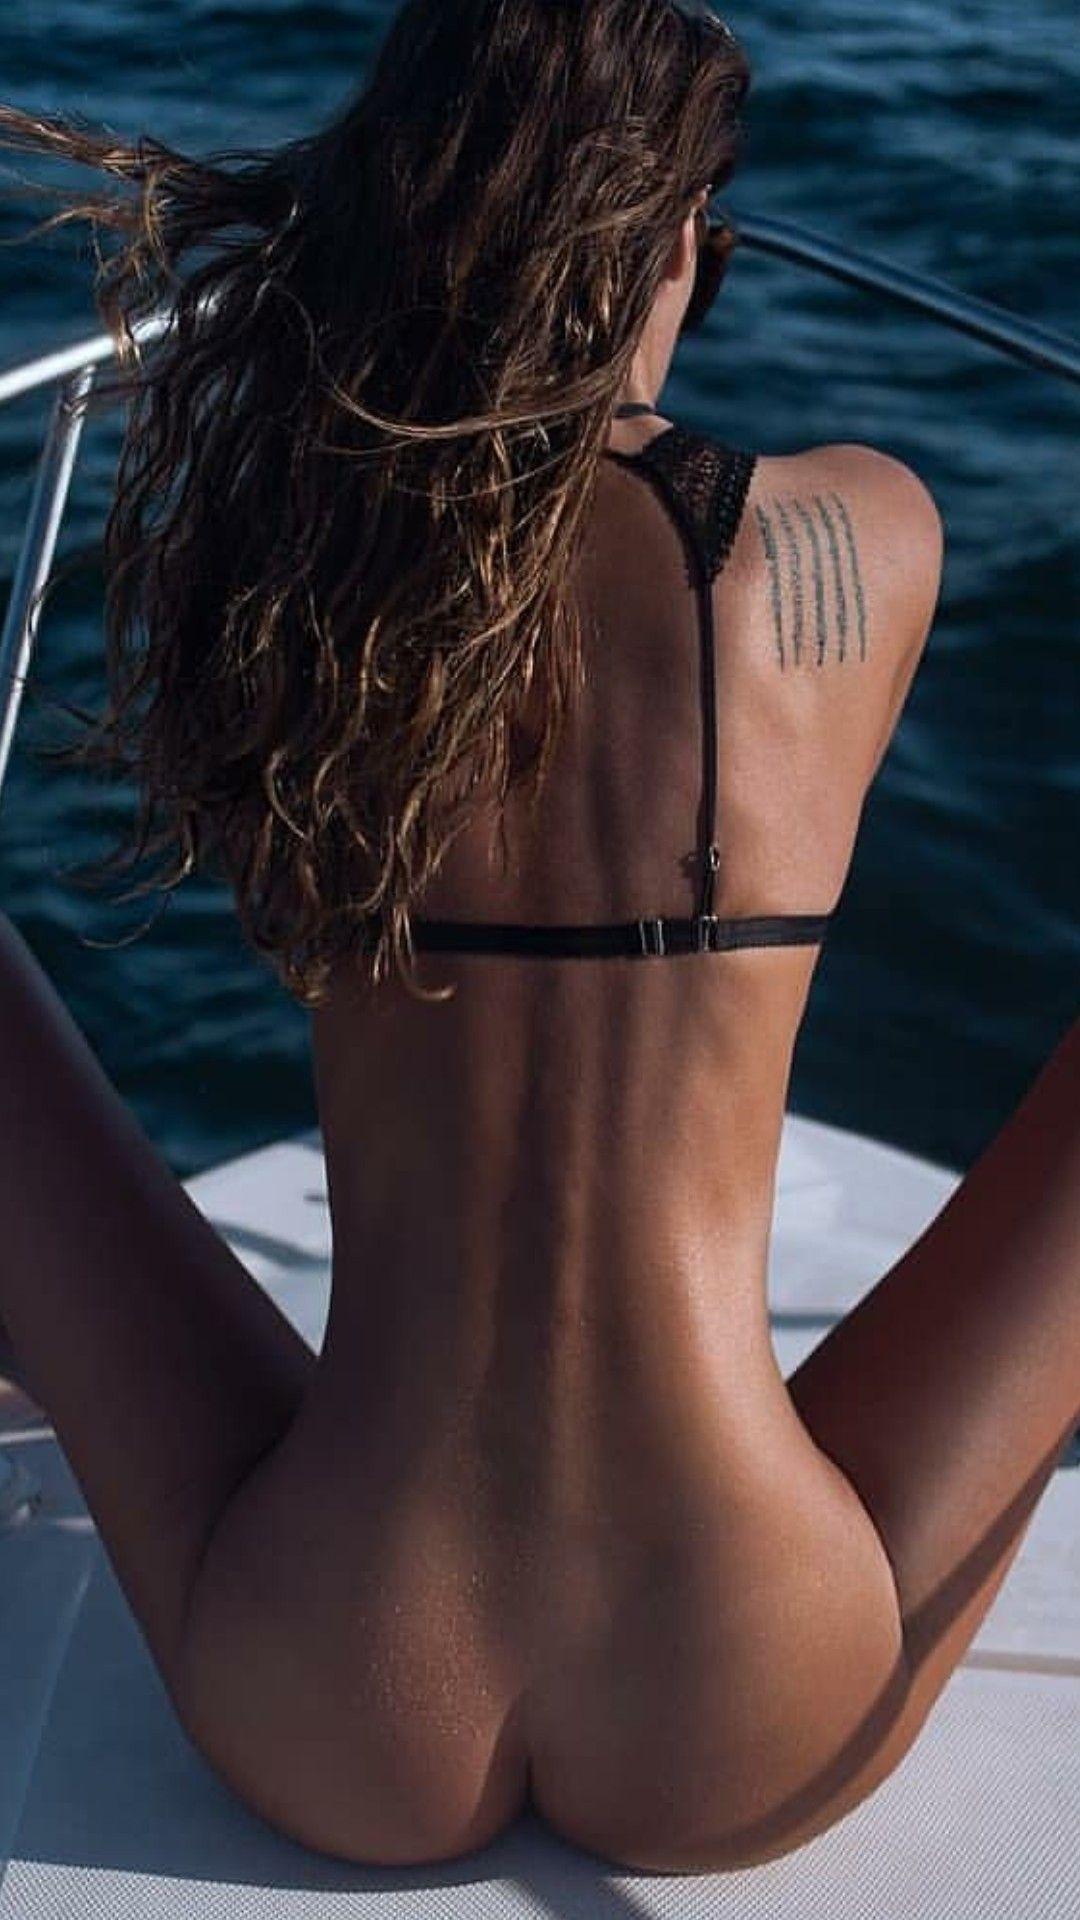 Free miley cyrus nude